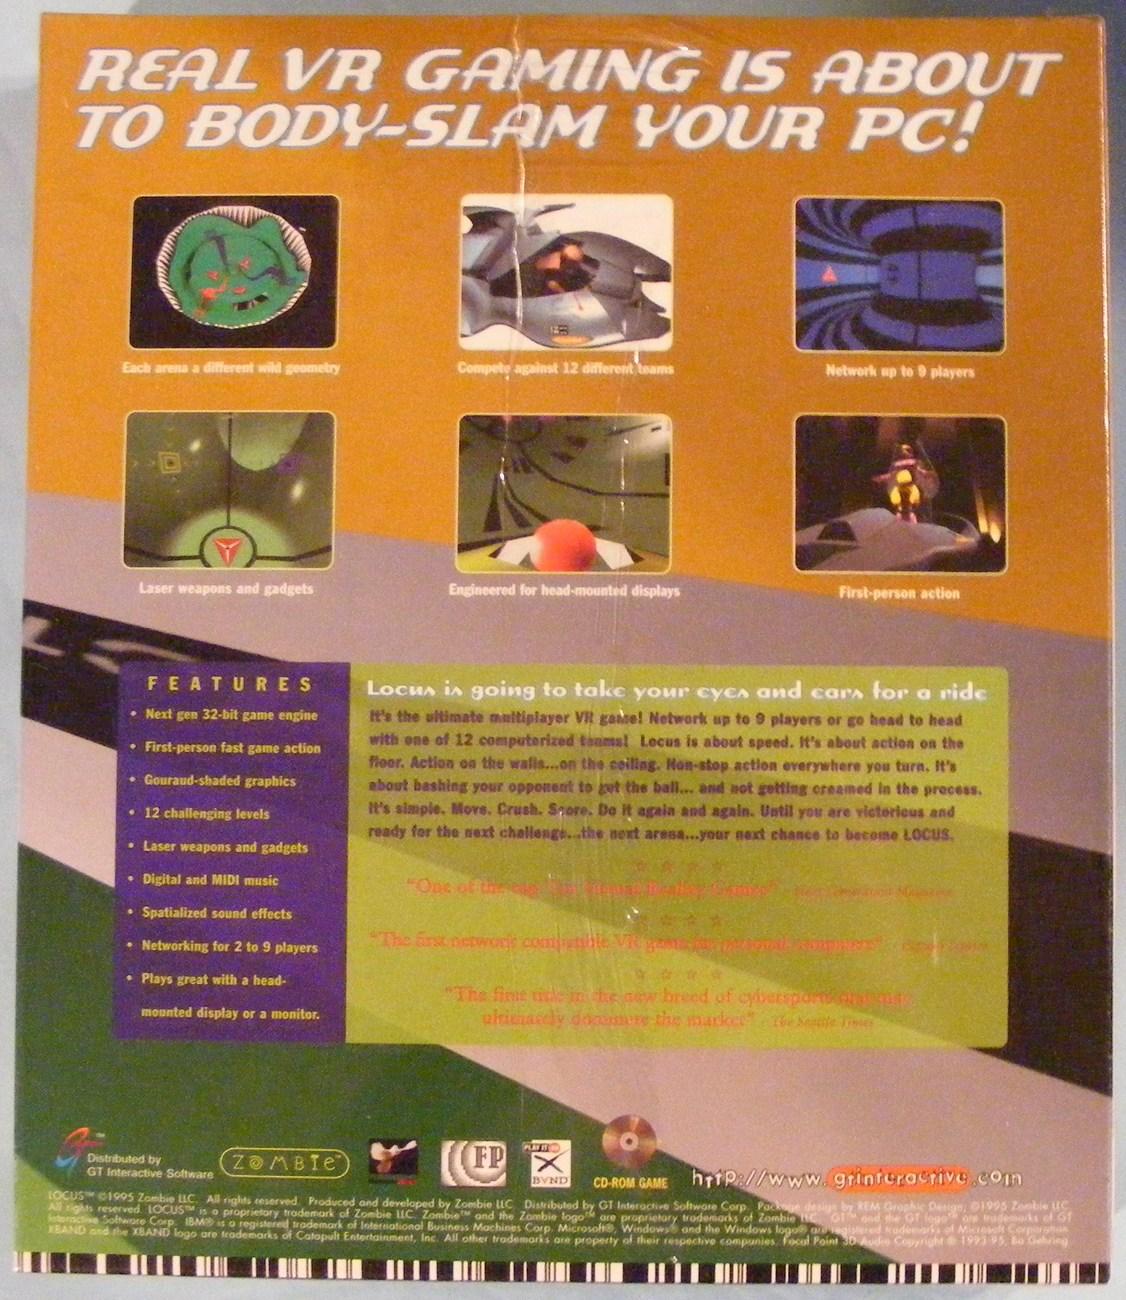 Powerslide Pc Game: 1995 Locus Virtual Reality PC Game